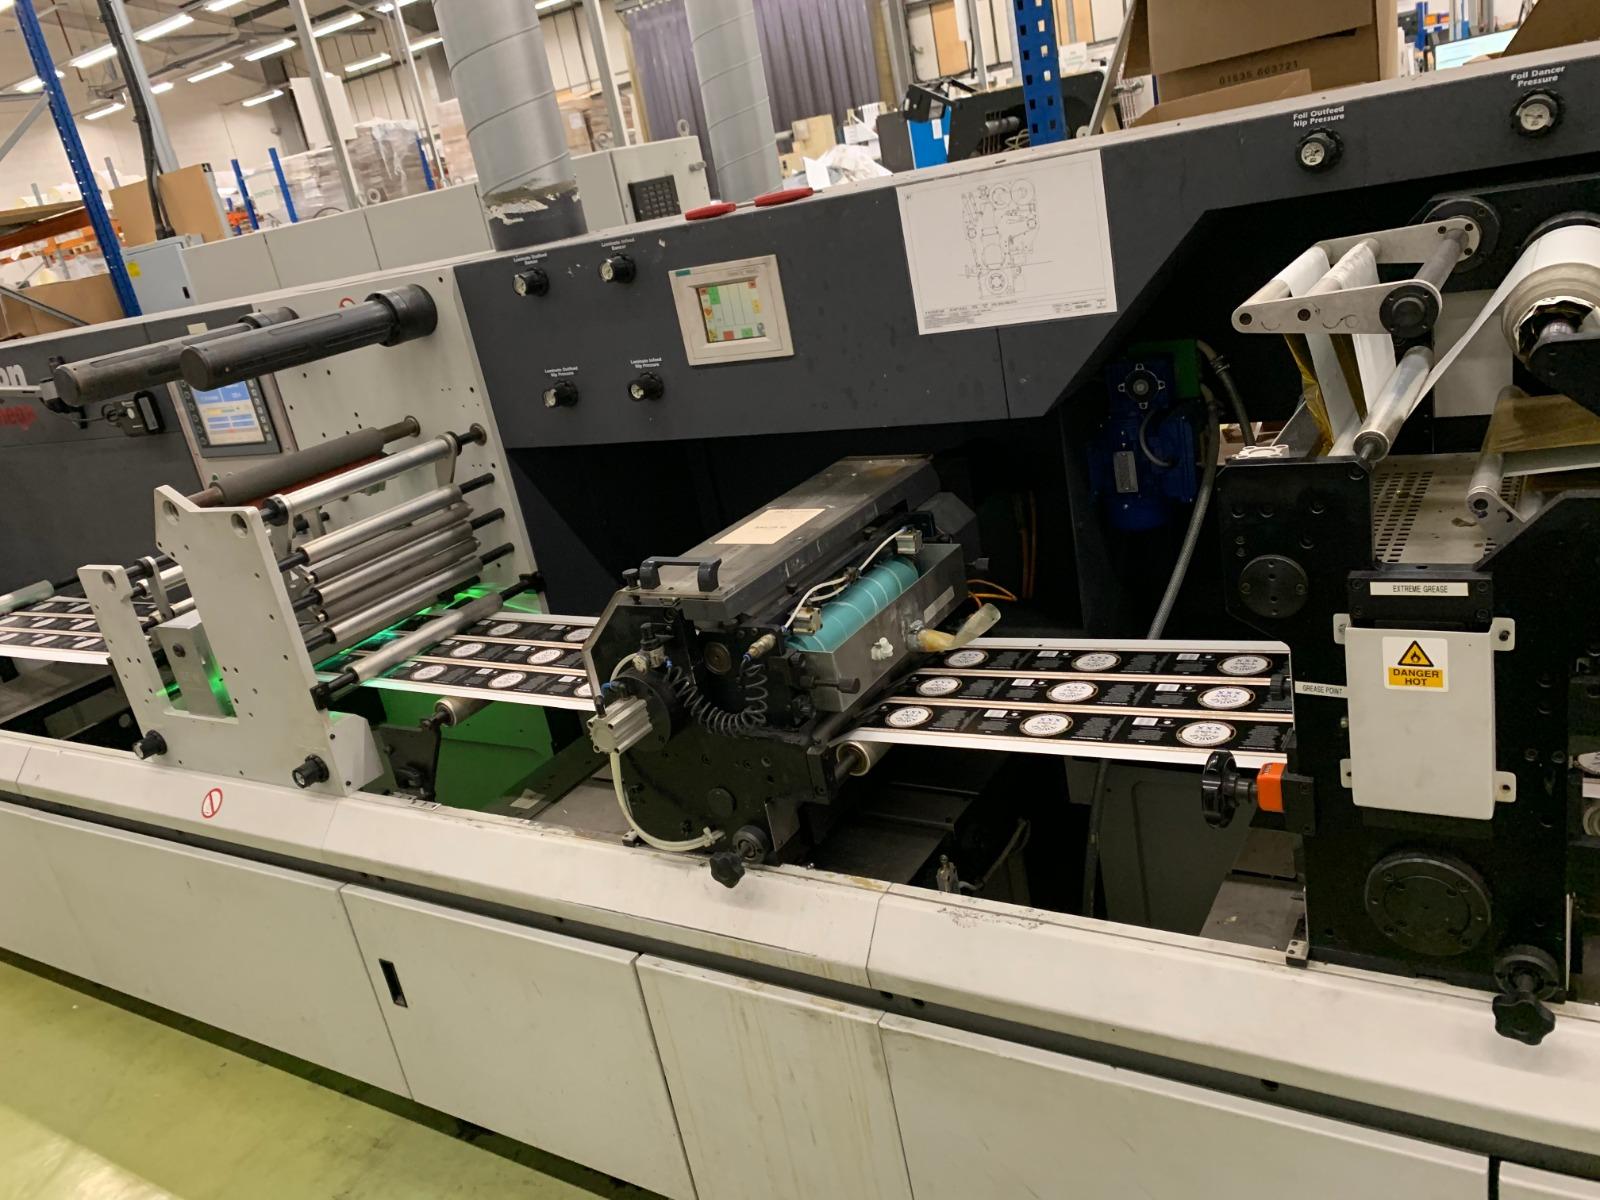 ABG Digicon Series 1 - Used Flexo Printing Presses and Used Flexographic Equipment-2